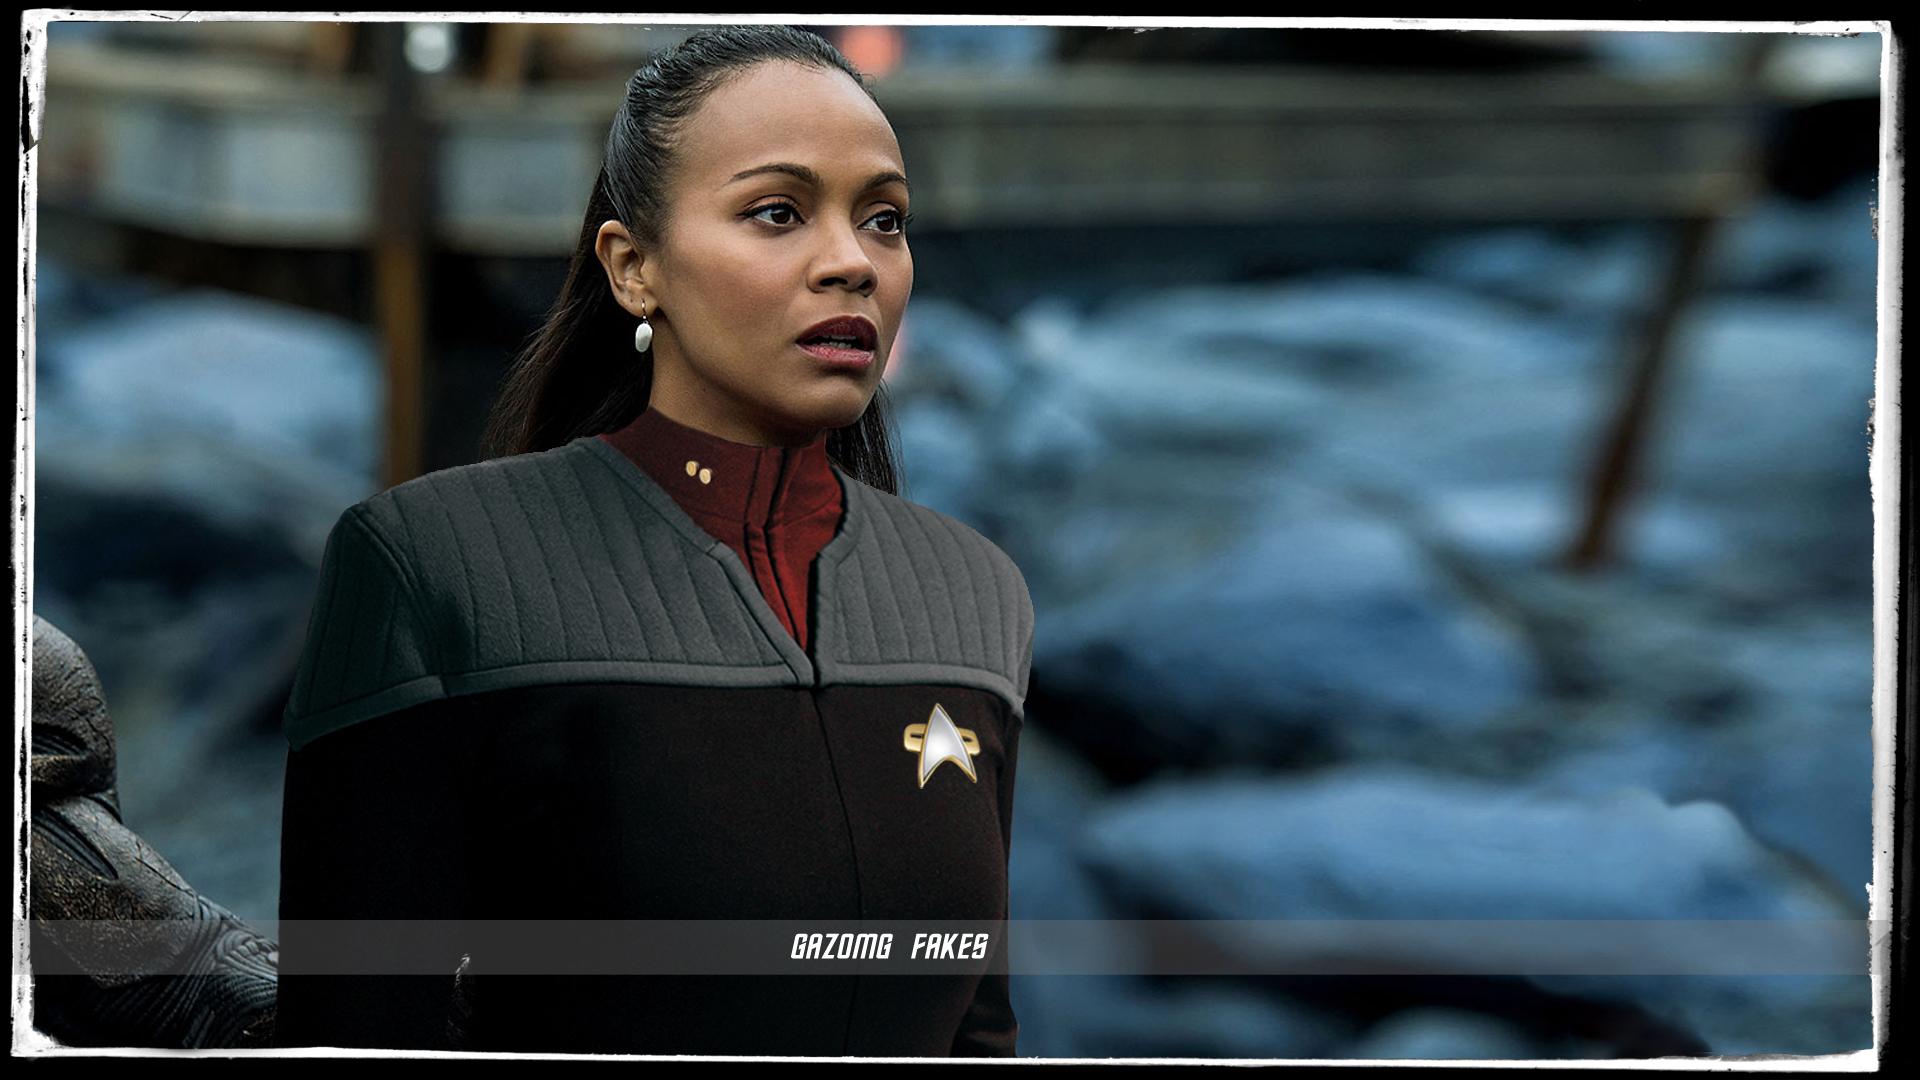 Zoe Saldana Star Trek Beyond Deep Space 9 Uniform By Gazomg